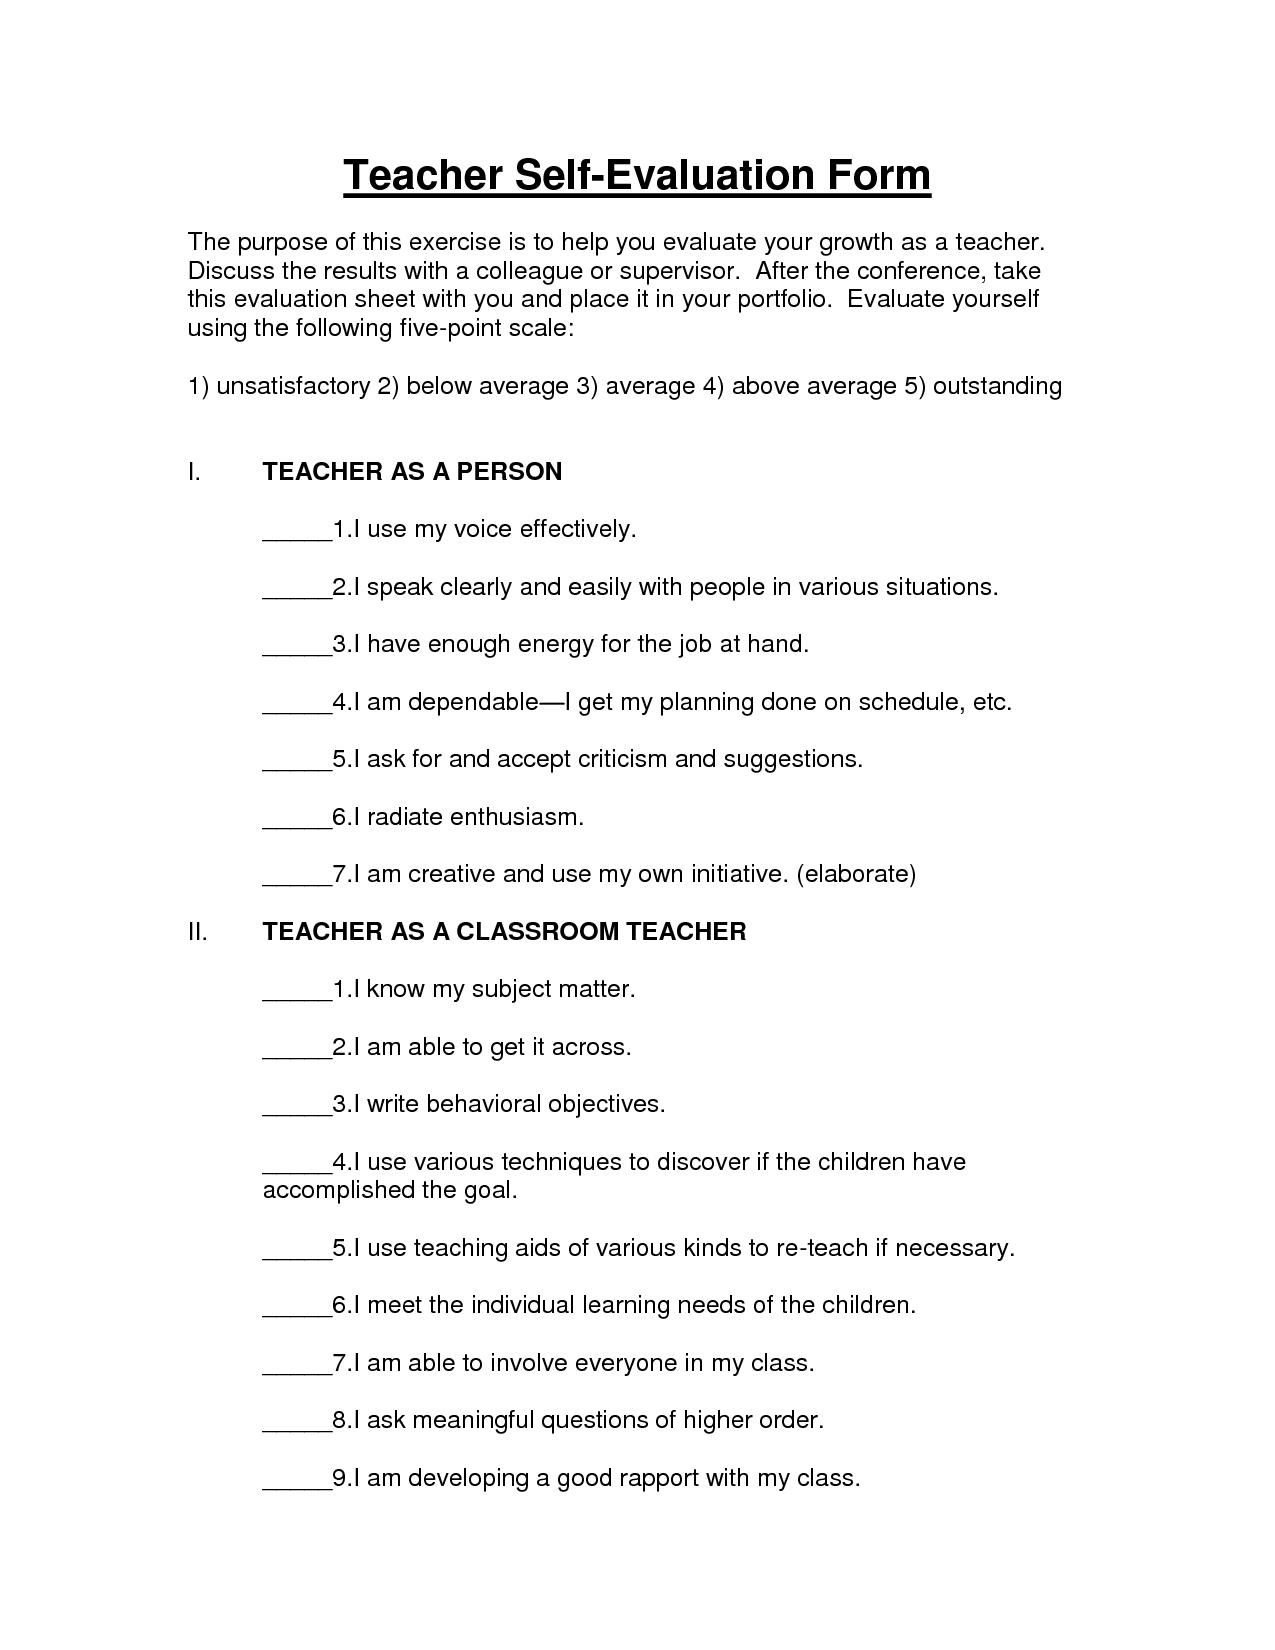 Teacher Self Assessmemnt | Teacher Self Evaluation Form